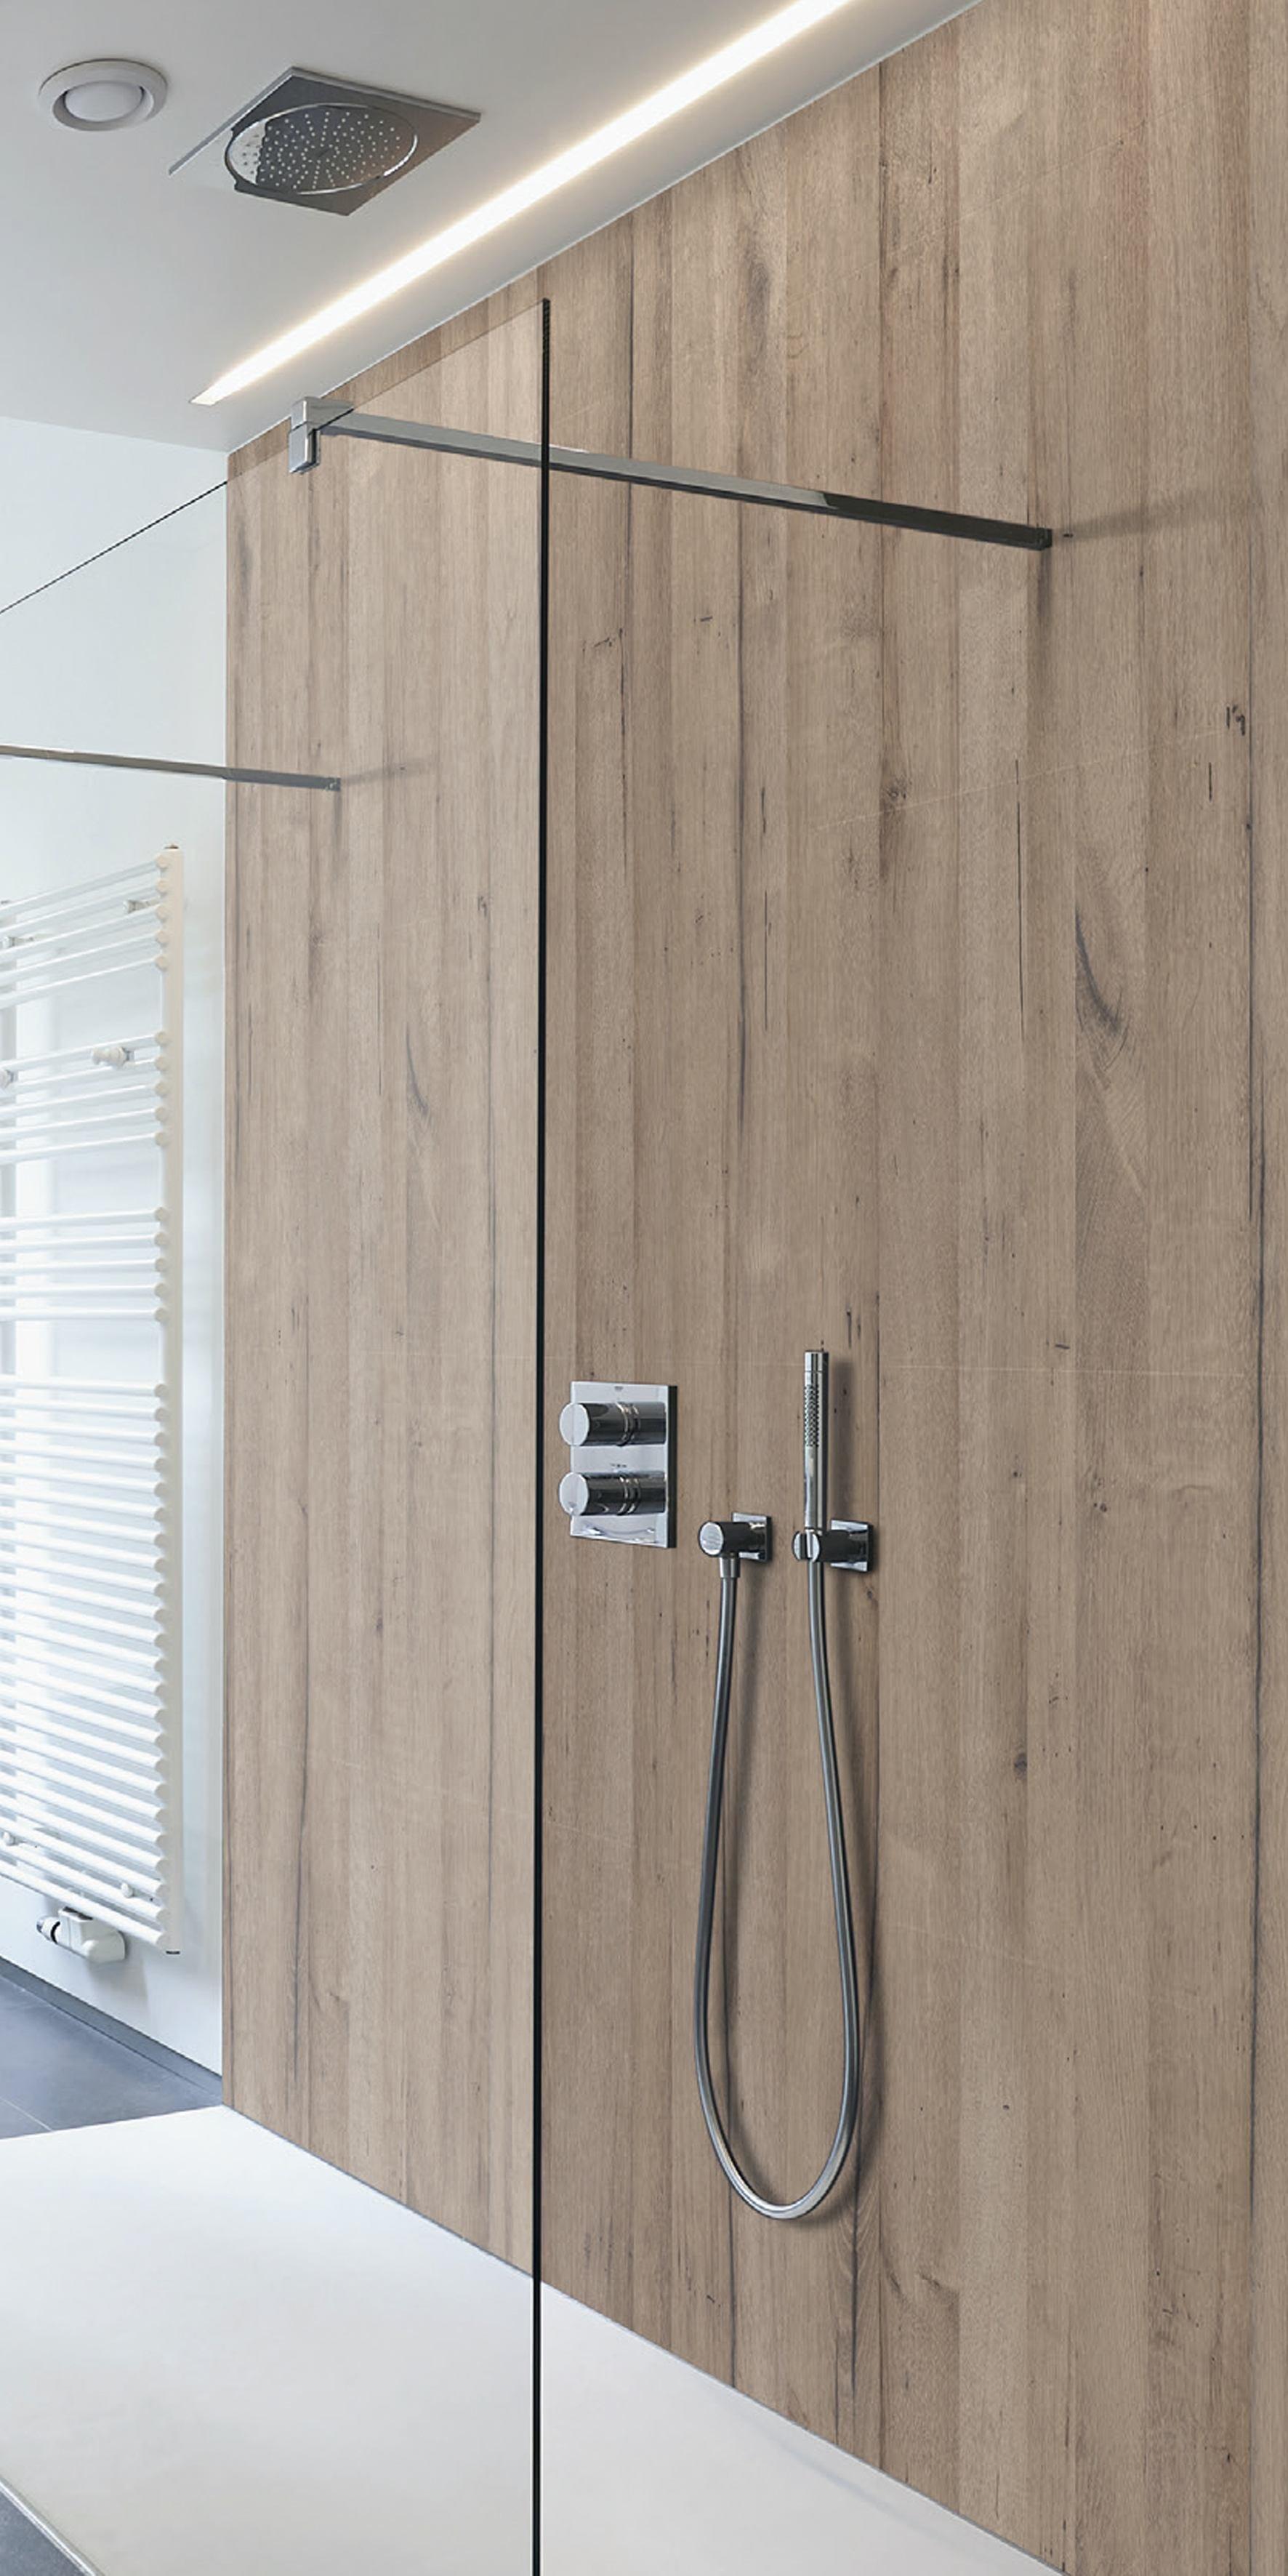 Koupelnov 233 Obkladov 233 Dekory N 225 Stěnn 253 Ch Panelů Vipanel Roth